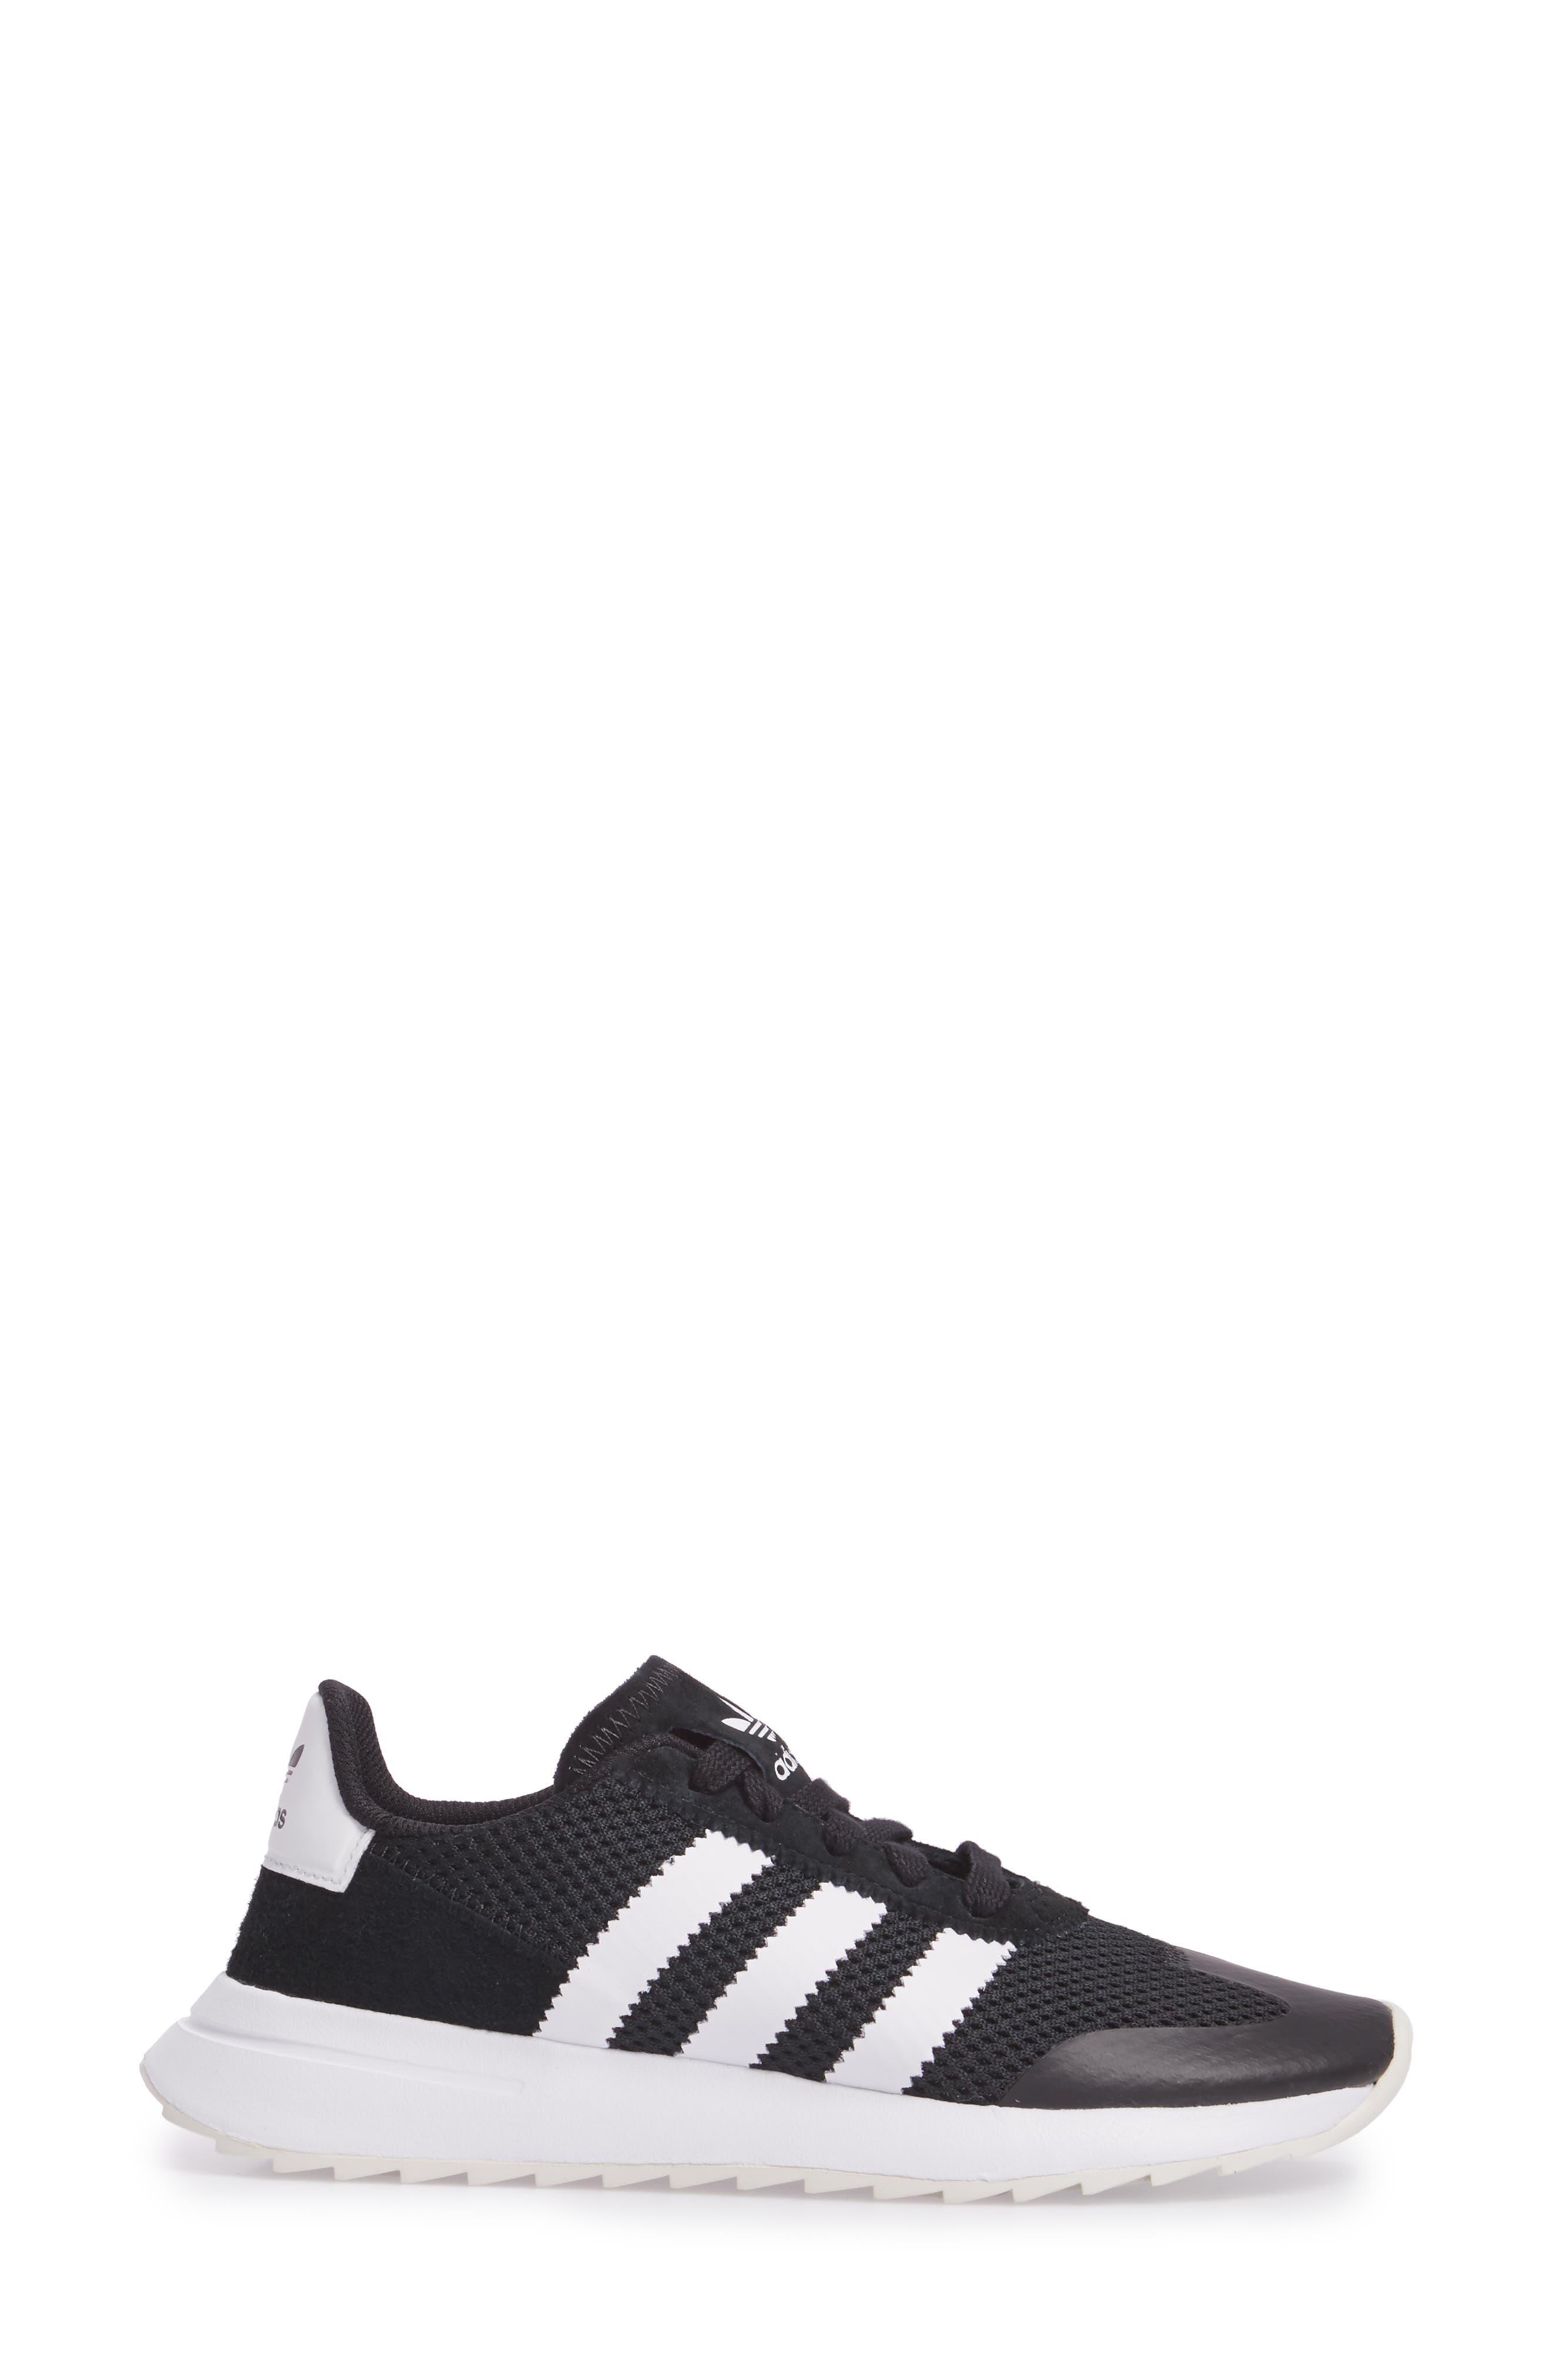 ADIDAS, Flashback Sneaker, Alternate thumbnail 3, color, 001